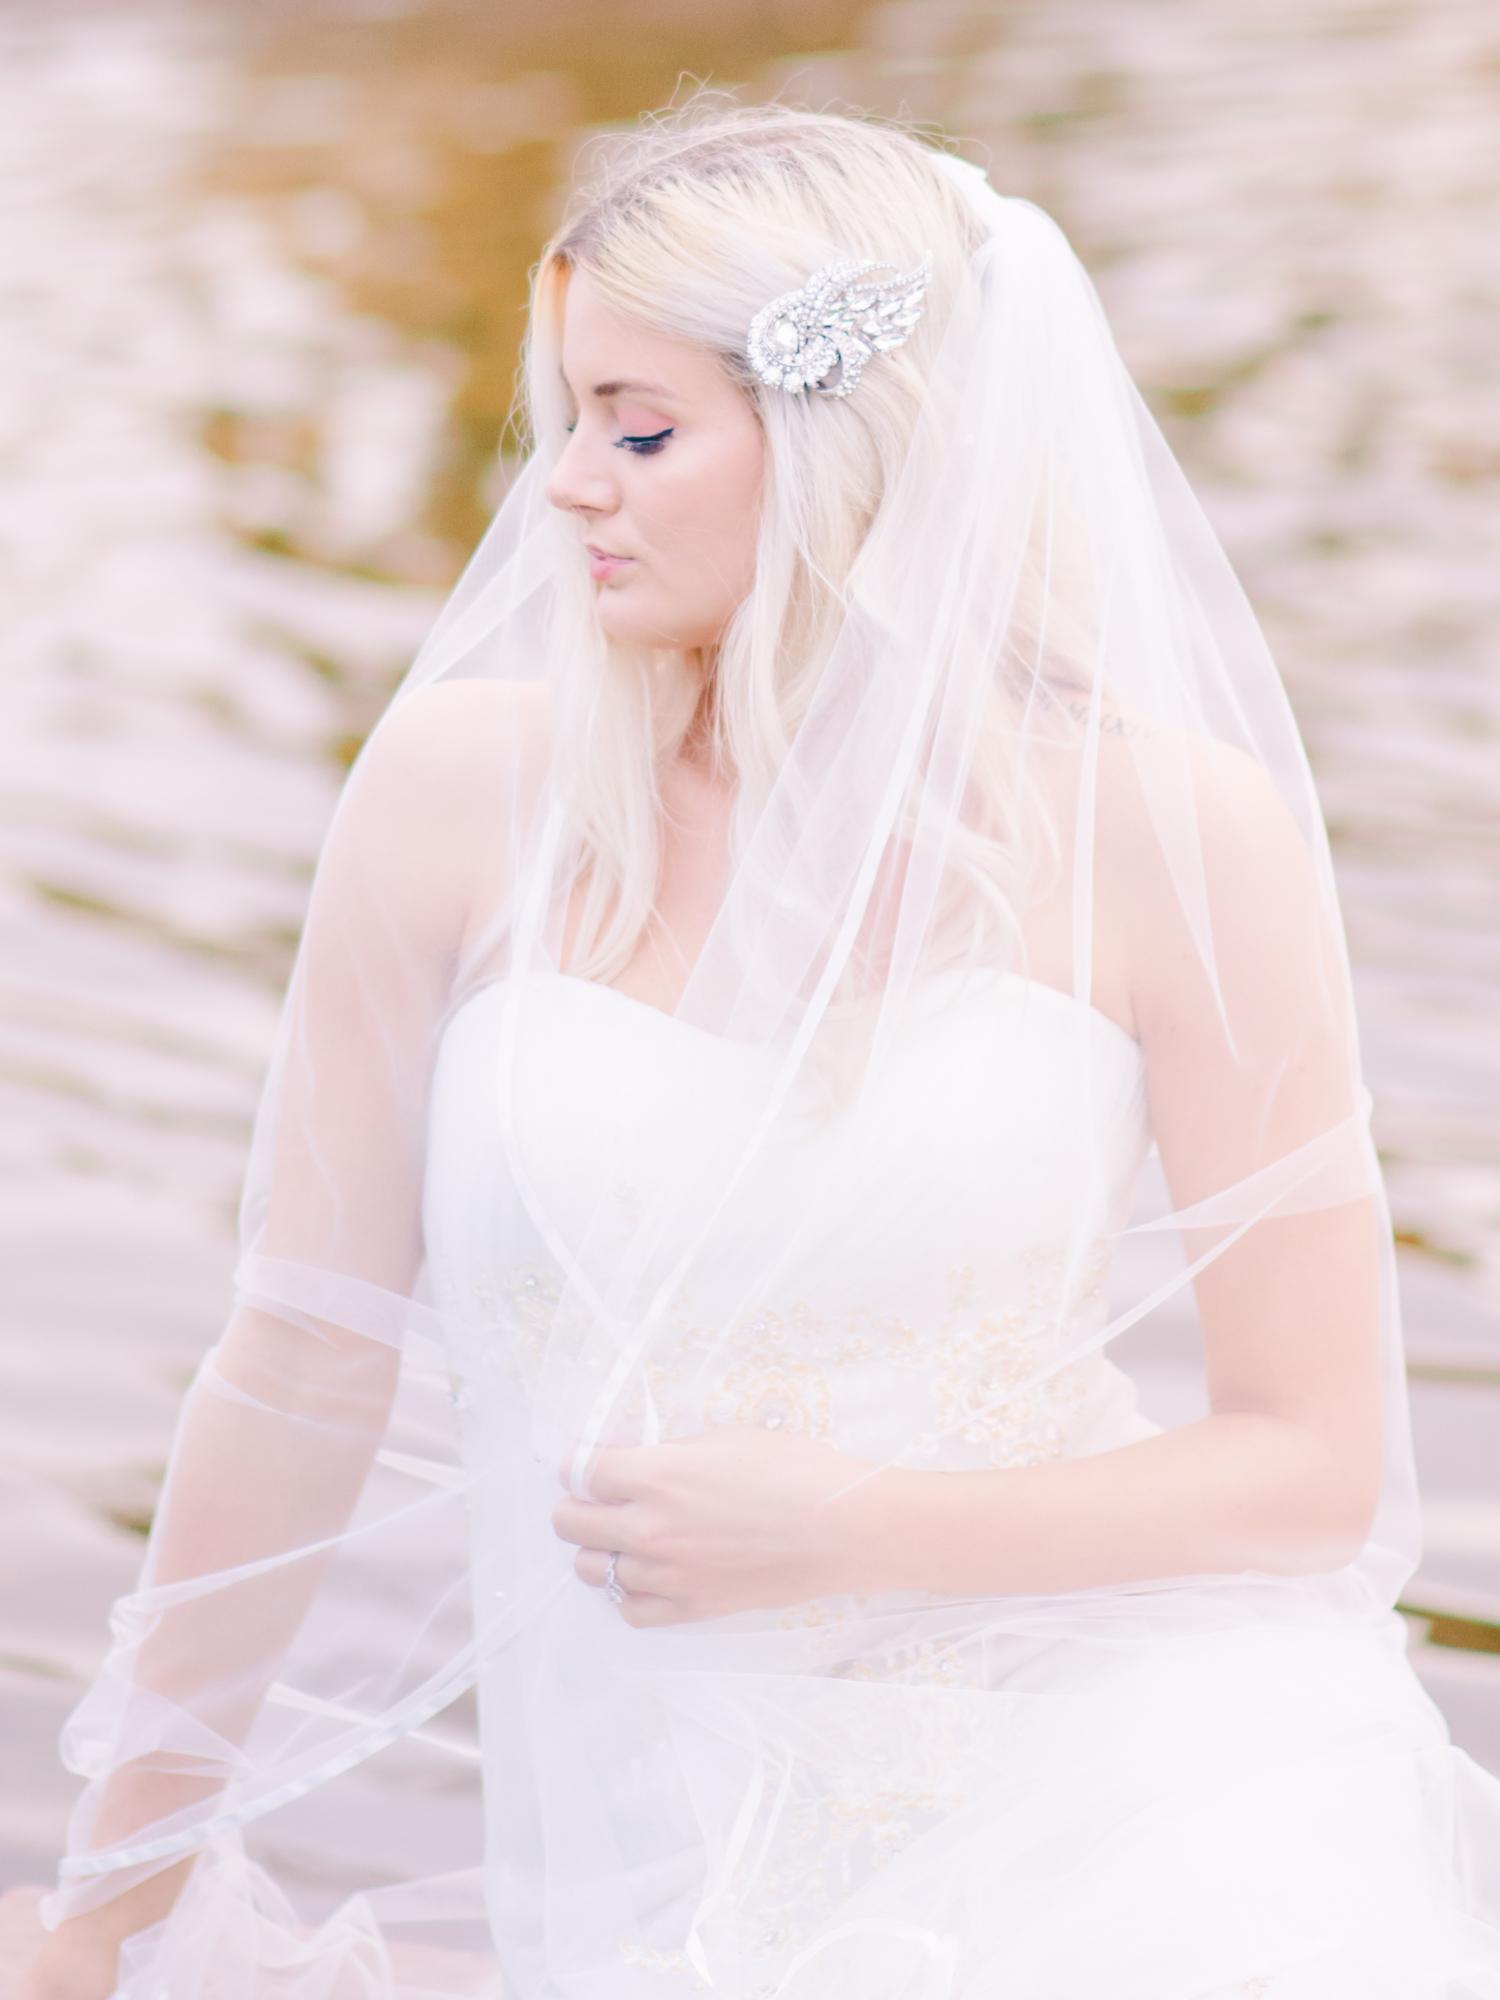 Elegant Organic Fall Swedish Bridal Wedding Styled Shoot - Erika Alvarenga Photography-37.jpg